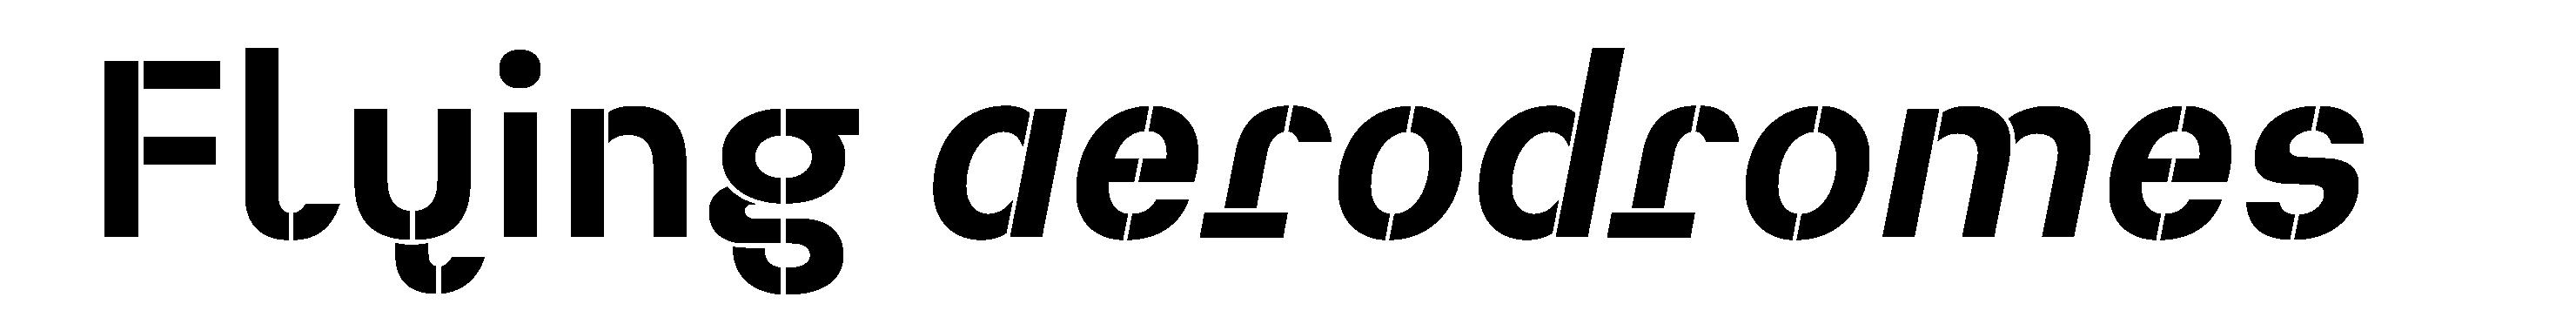 Typeface Heimat Stencil D05 Atlas Font Foundry